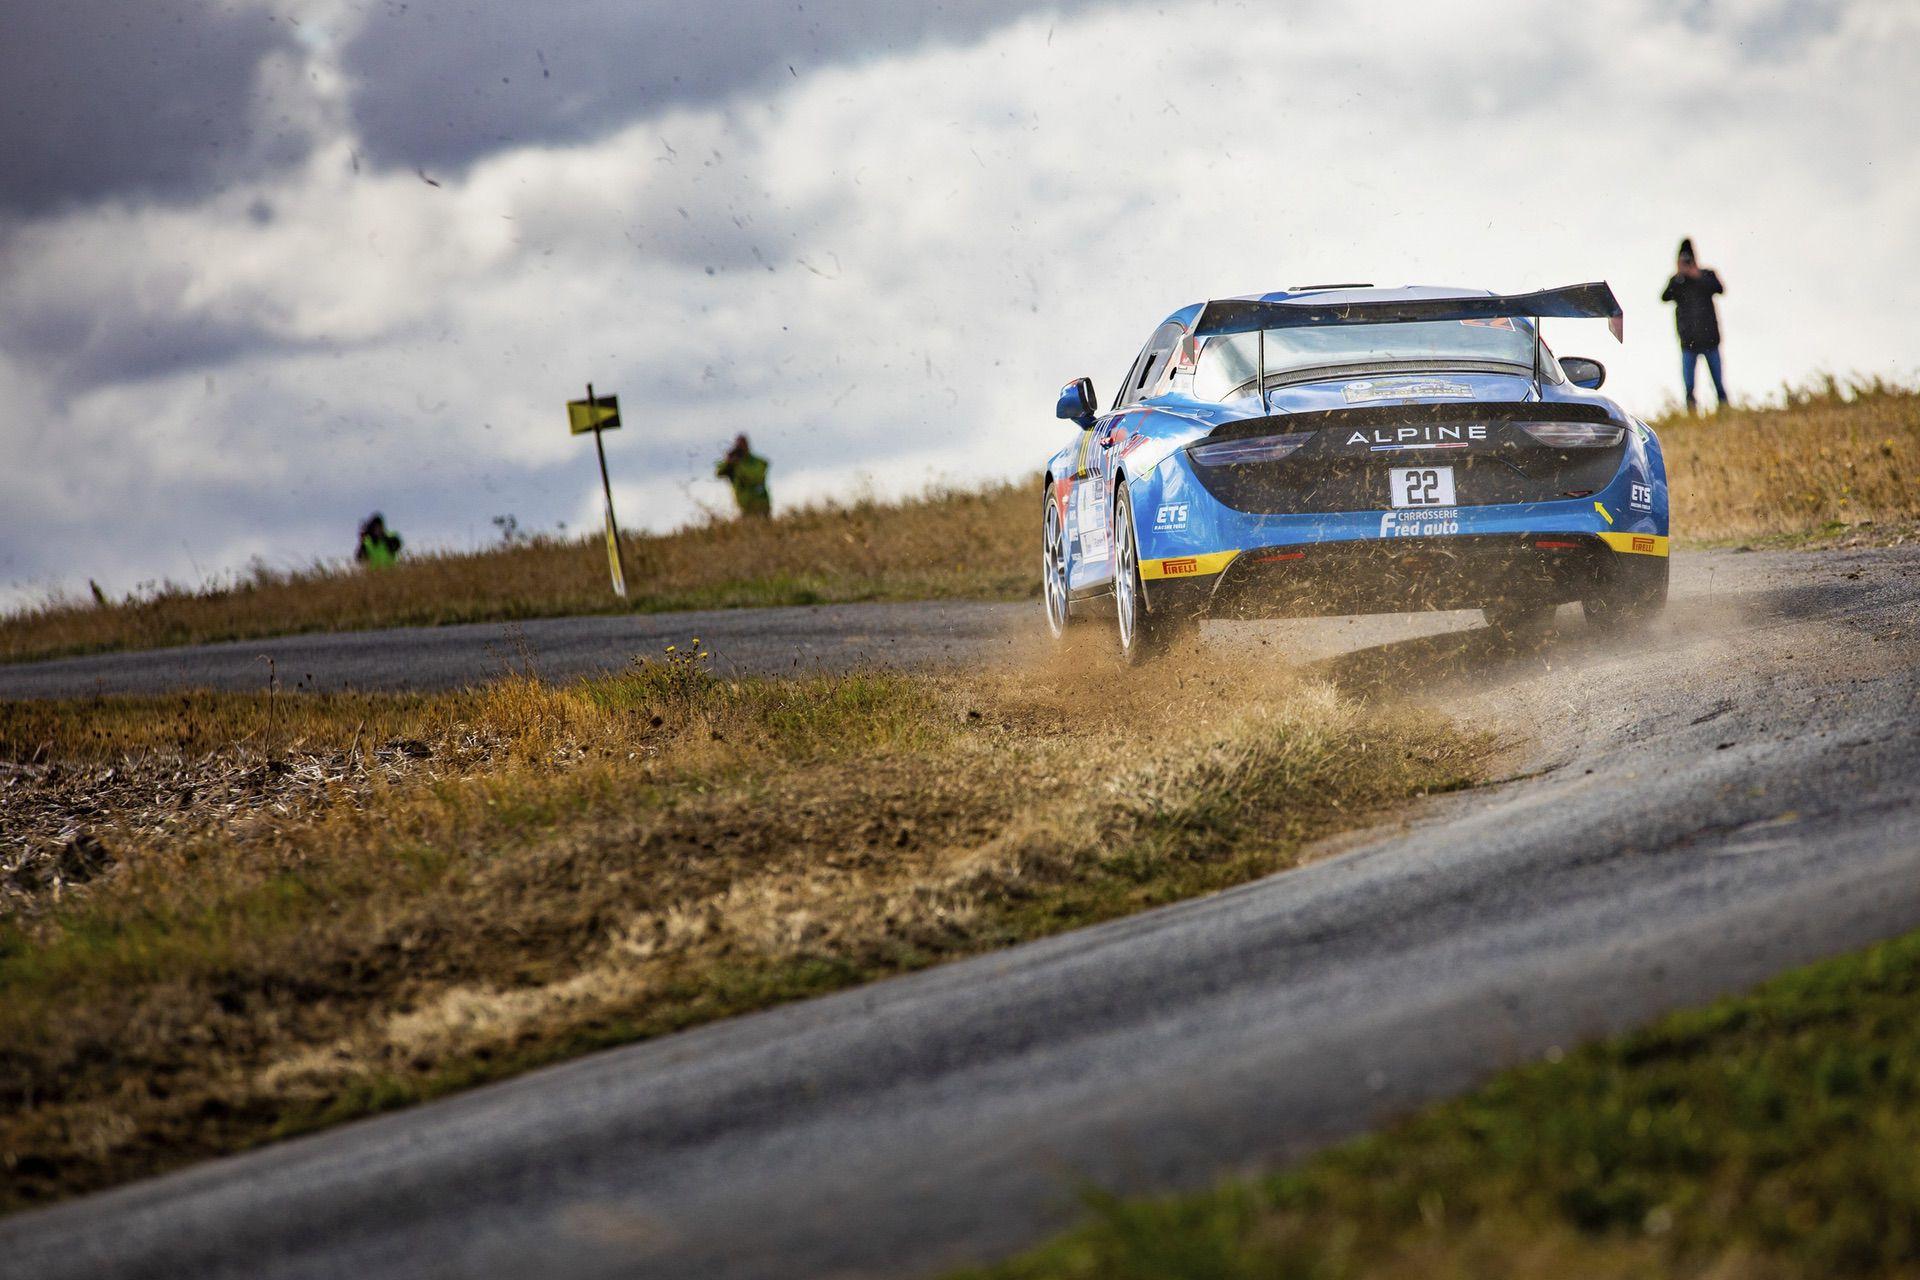 20-2021-Alpine-Story-Rallye